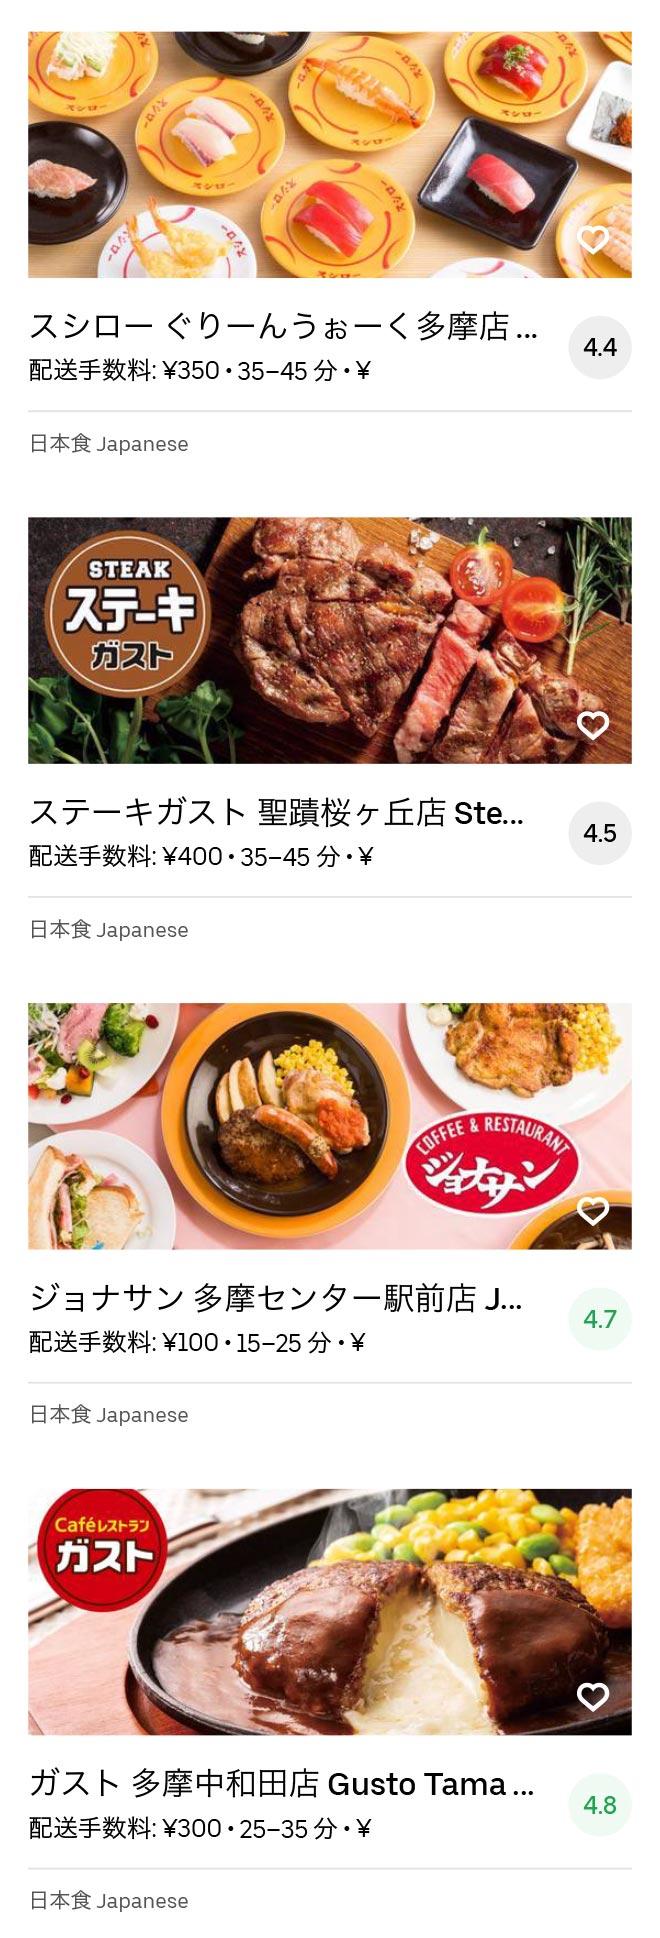 Tama center menu 2007 06